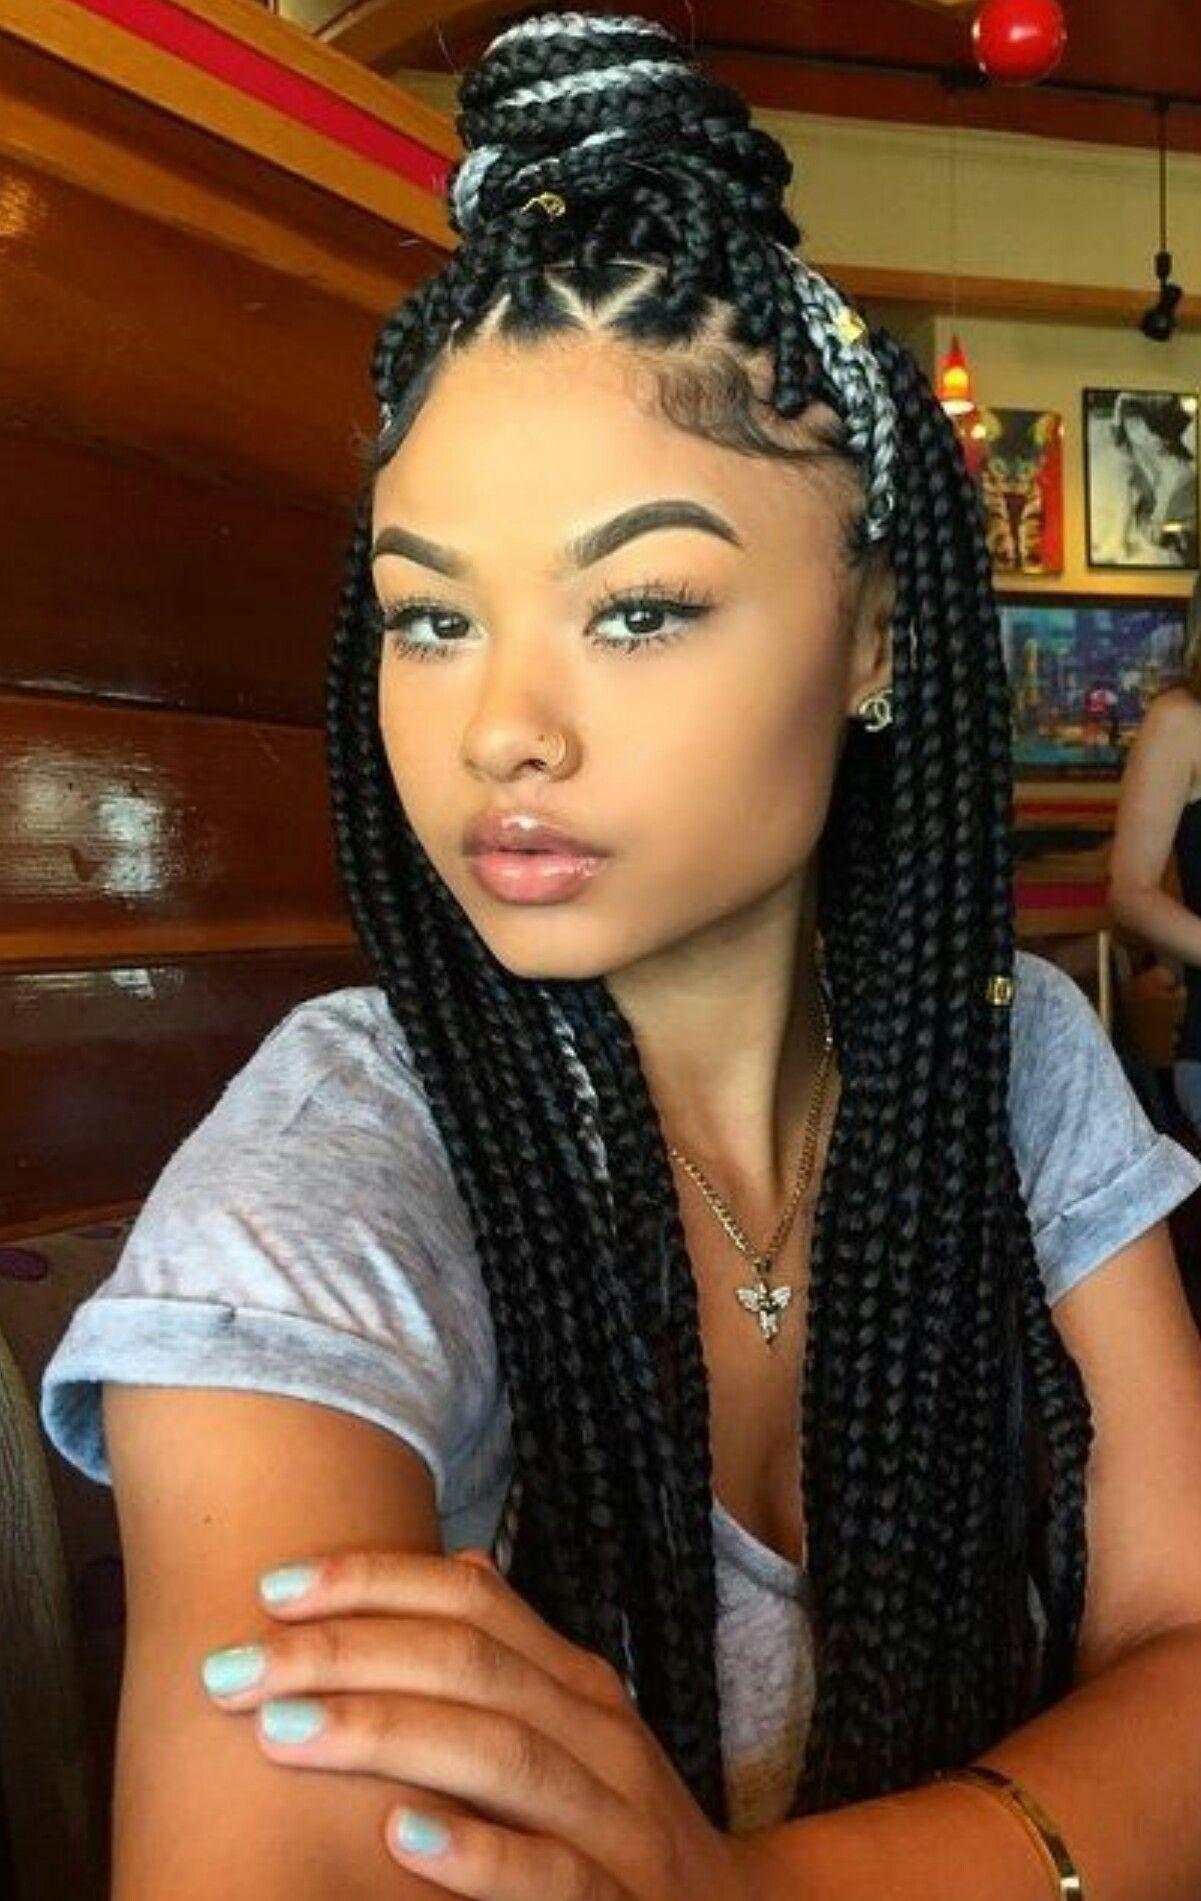 Pin by c w on Hairstyles | Pinterest | Jumbo braids, Weave styles ...